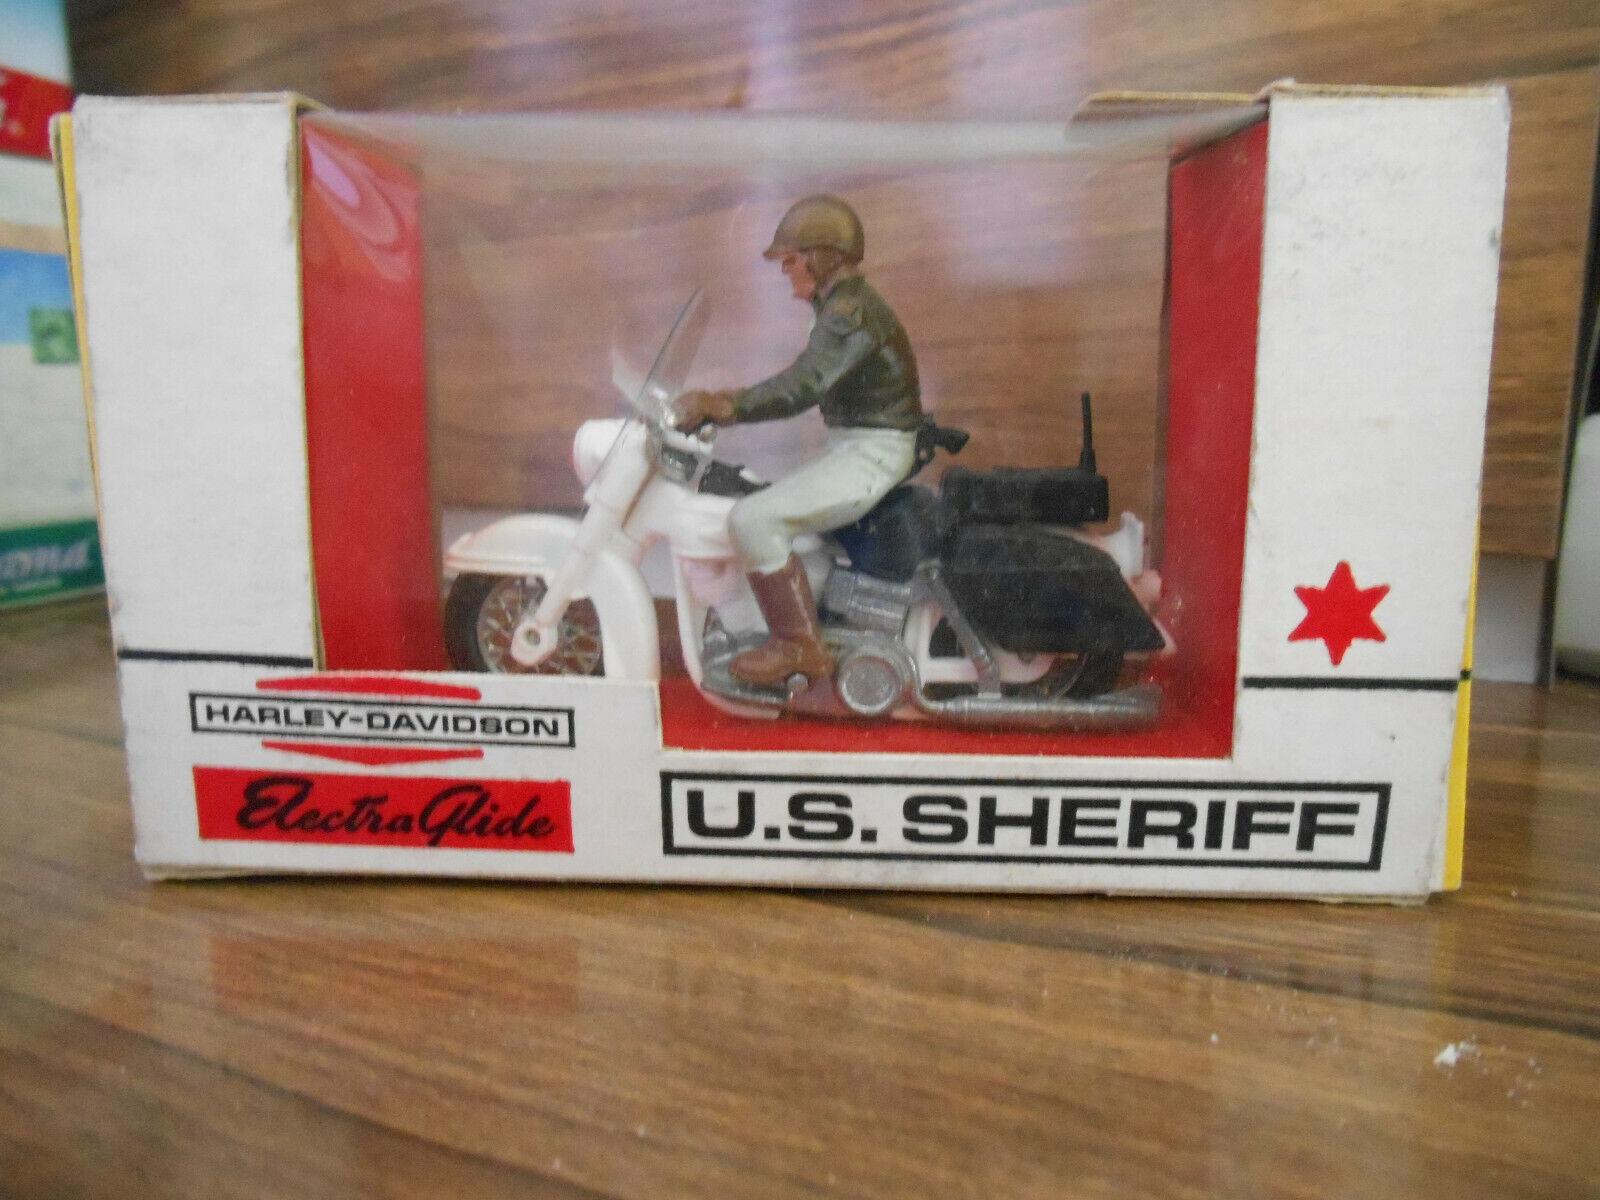 Harley Davidson Electra Glide U.S. SHERIFF – BRITAINS LTD. 1960s 1 32e 9692